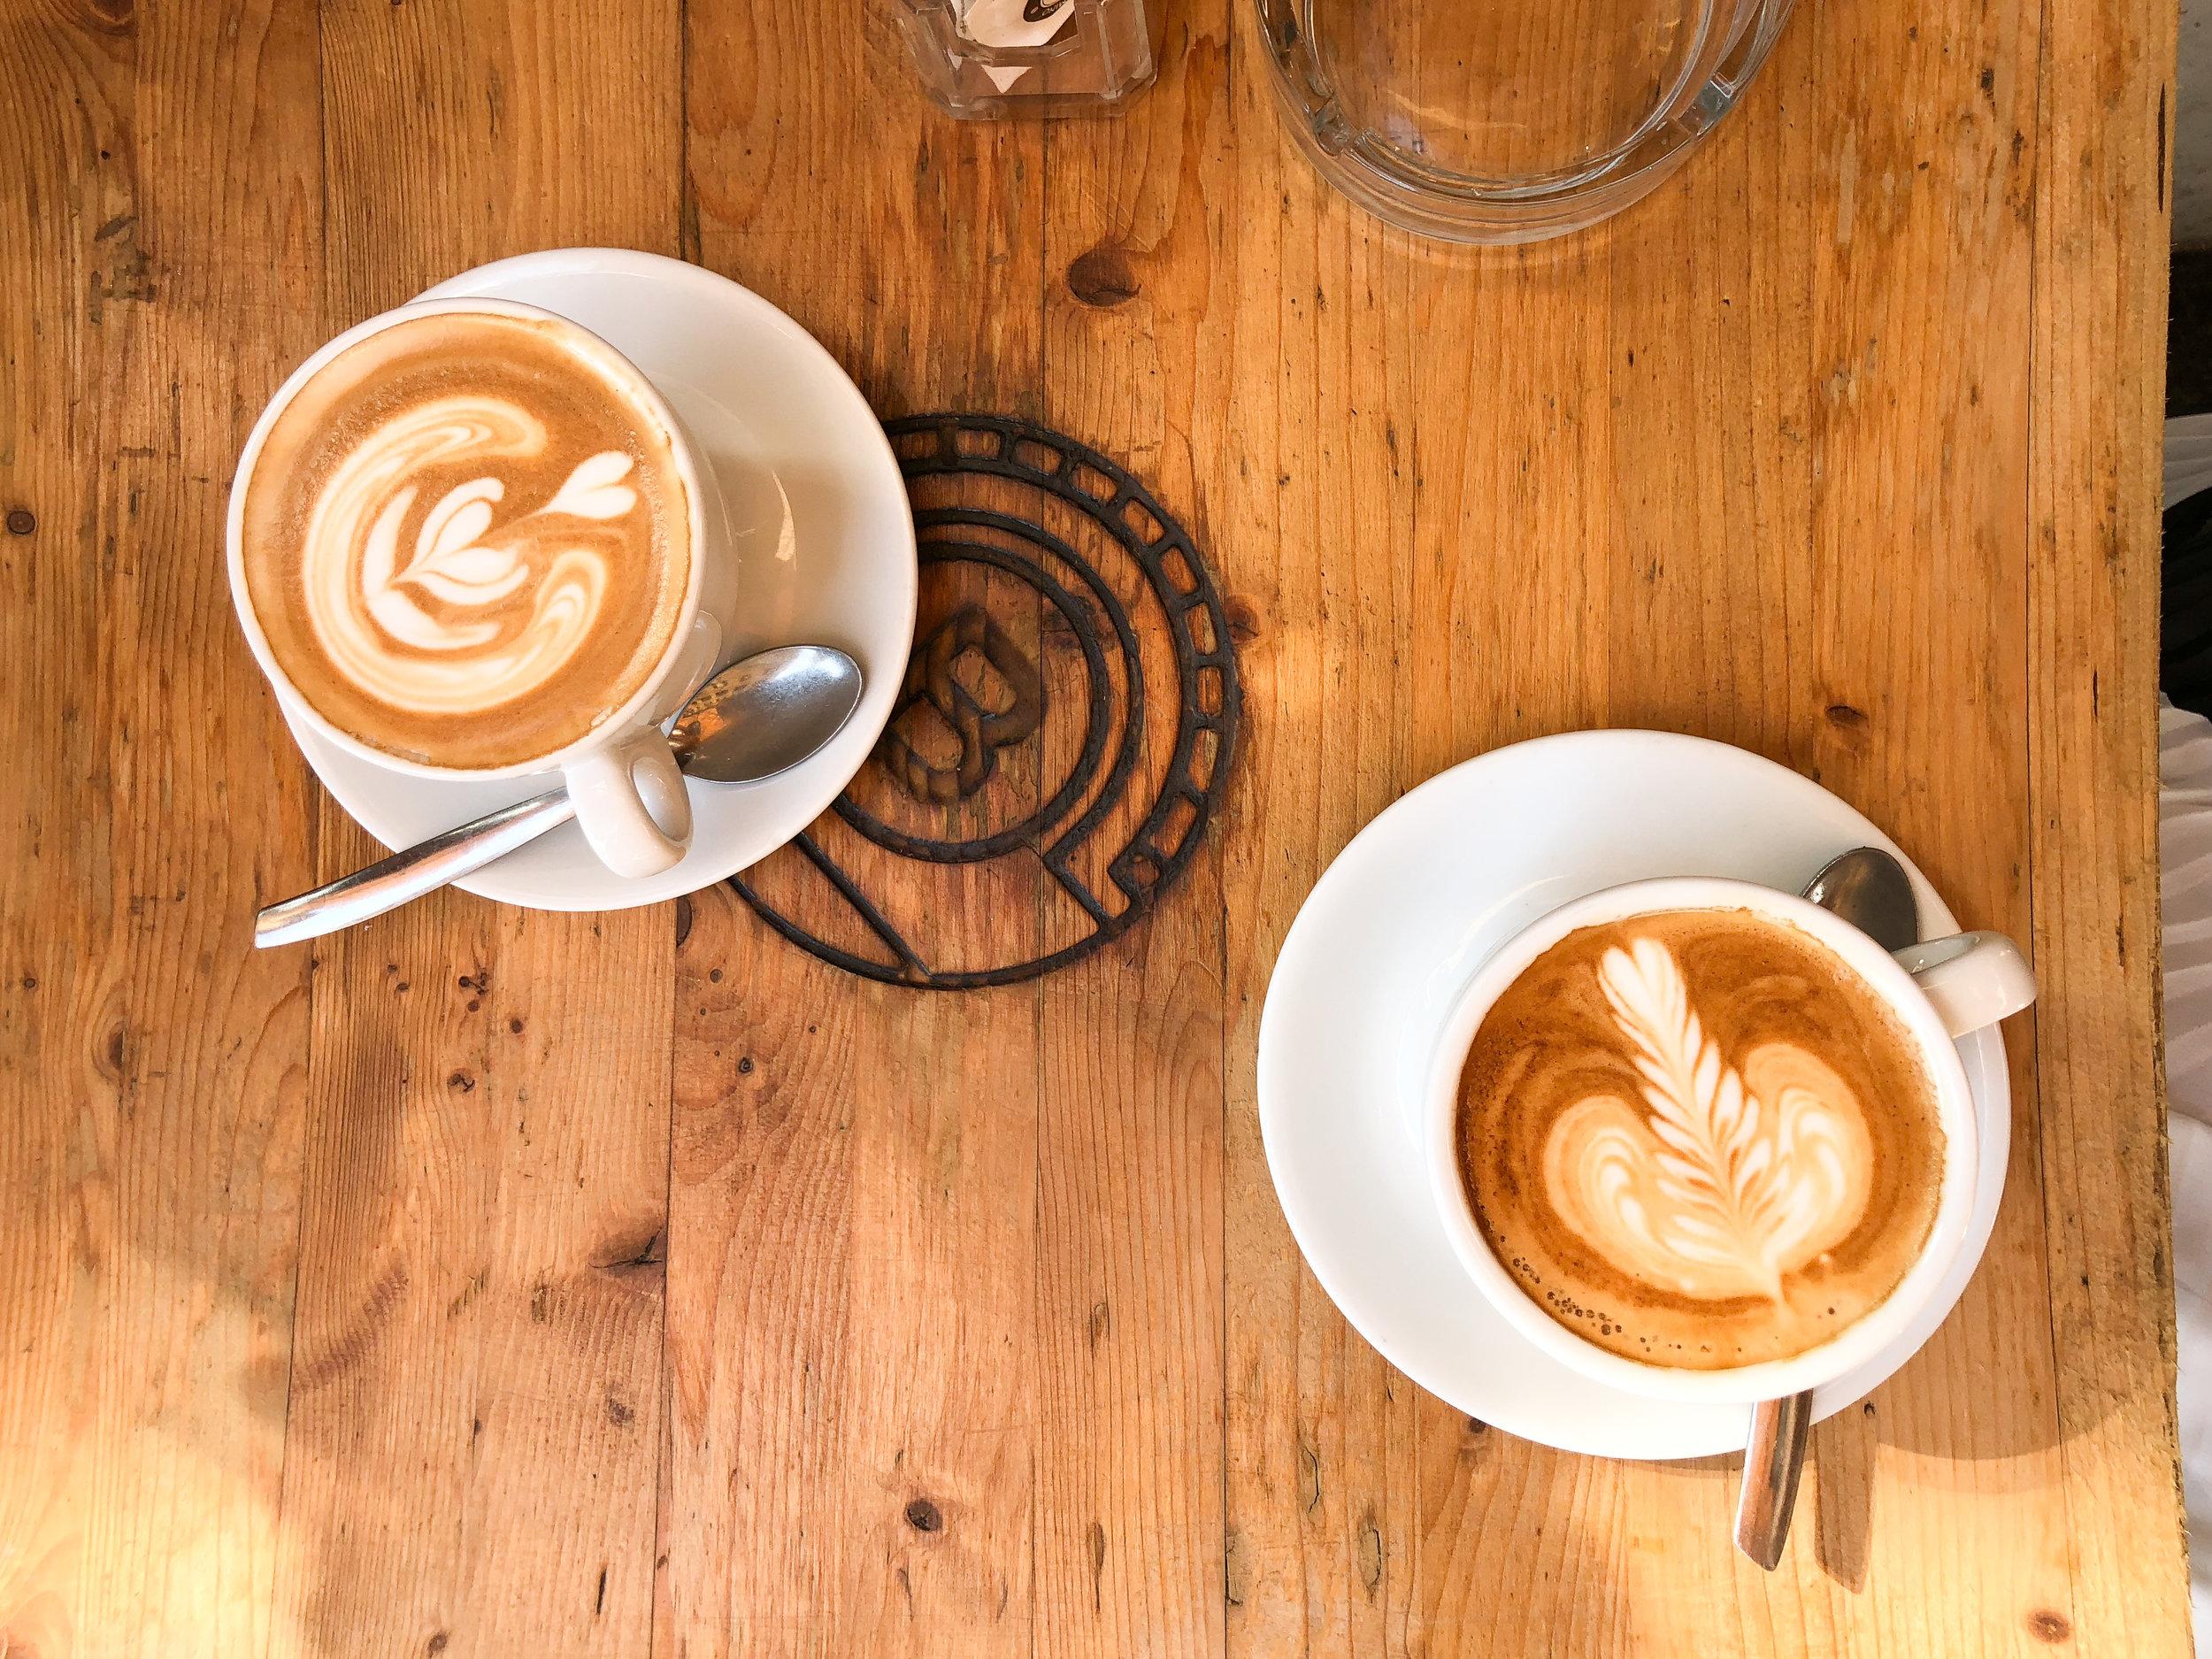 cappuccinos at Pergamino Caffe